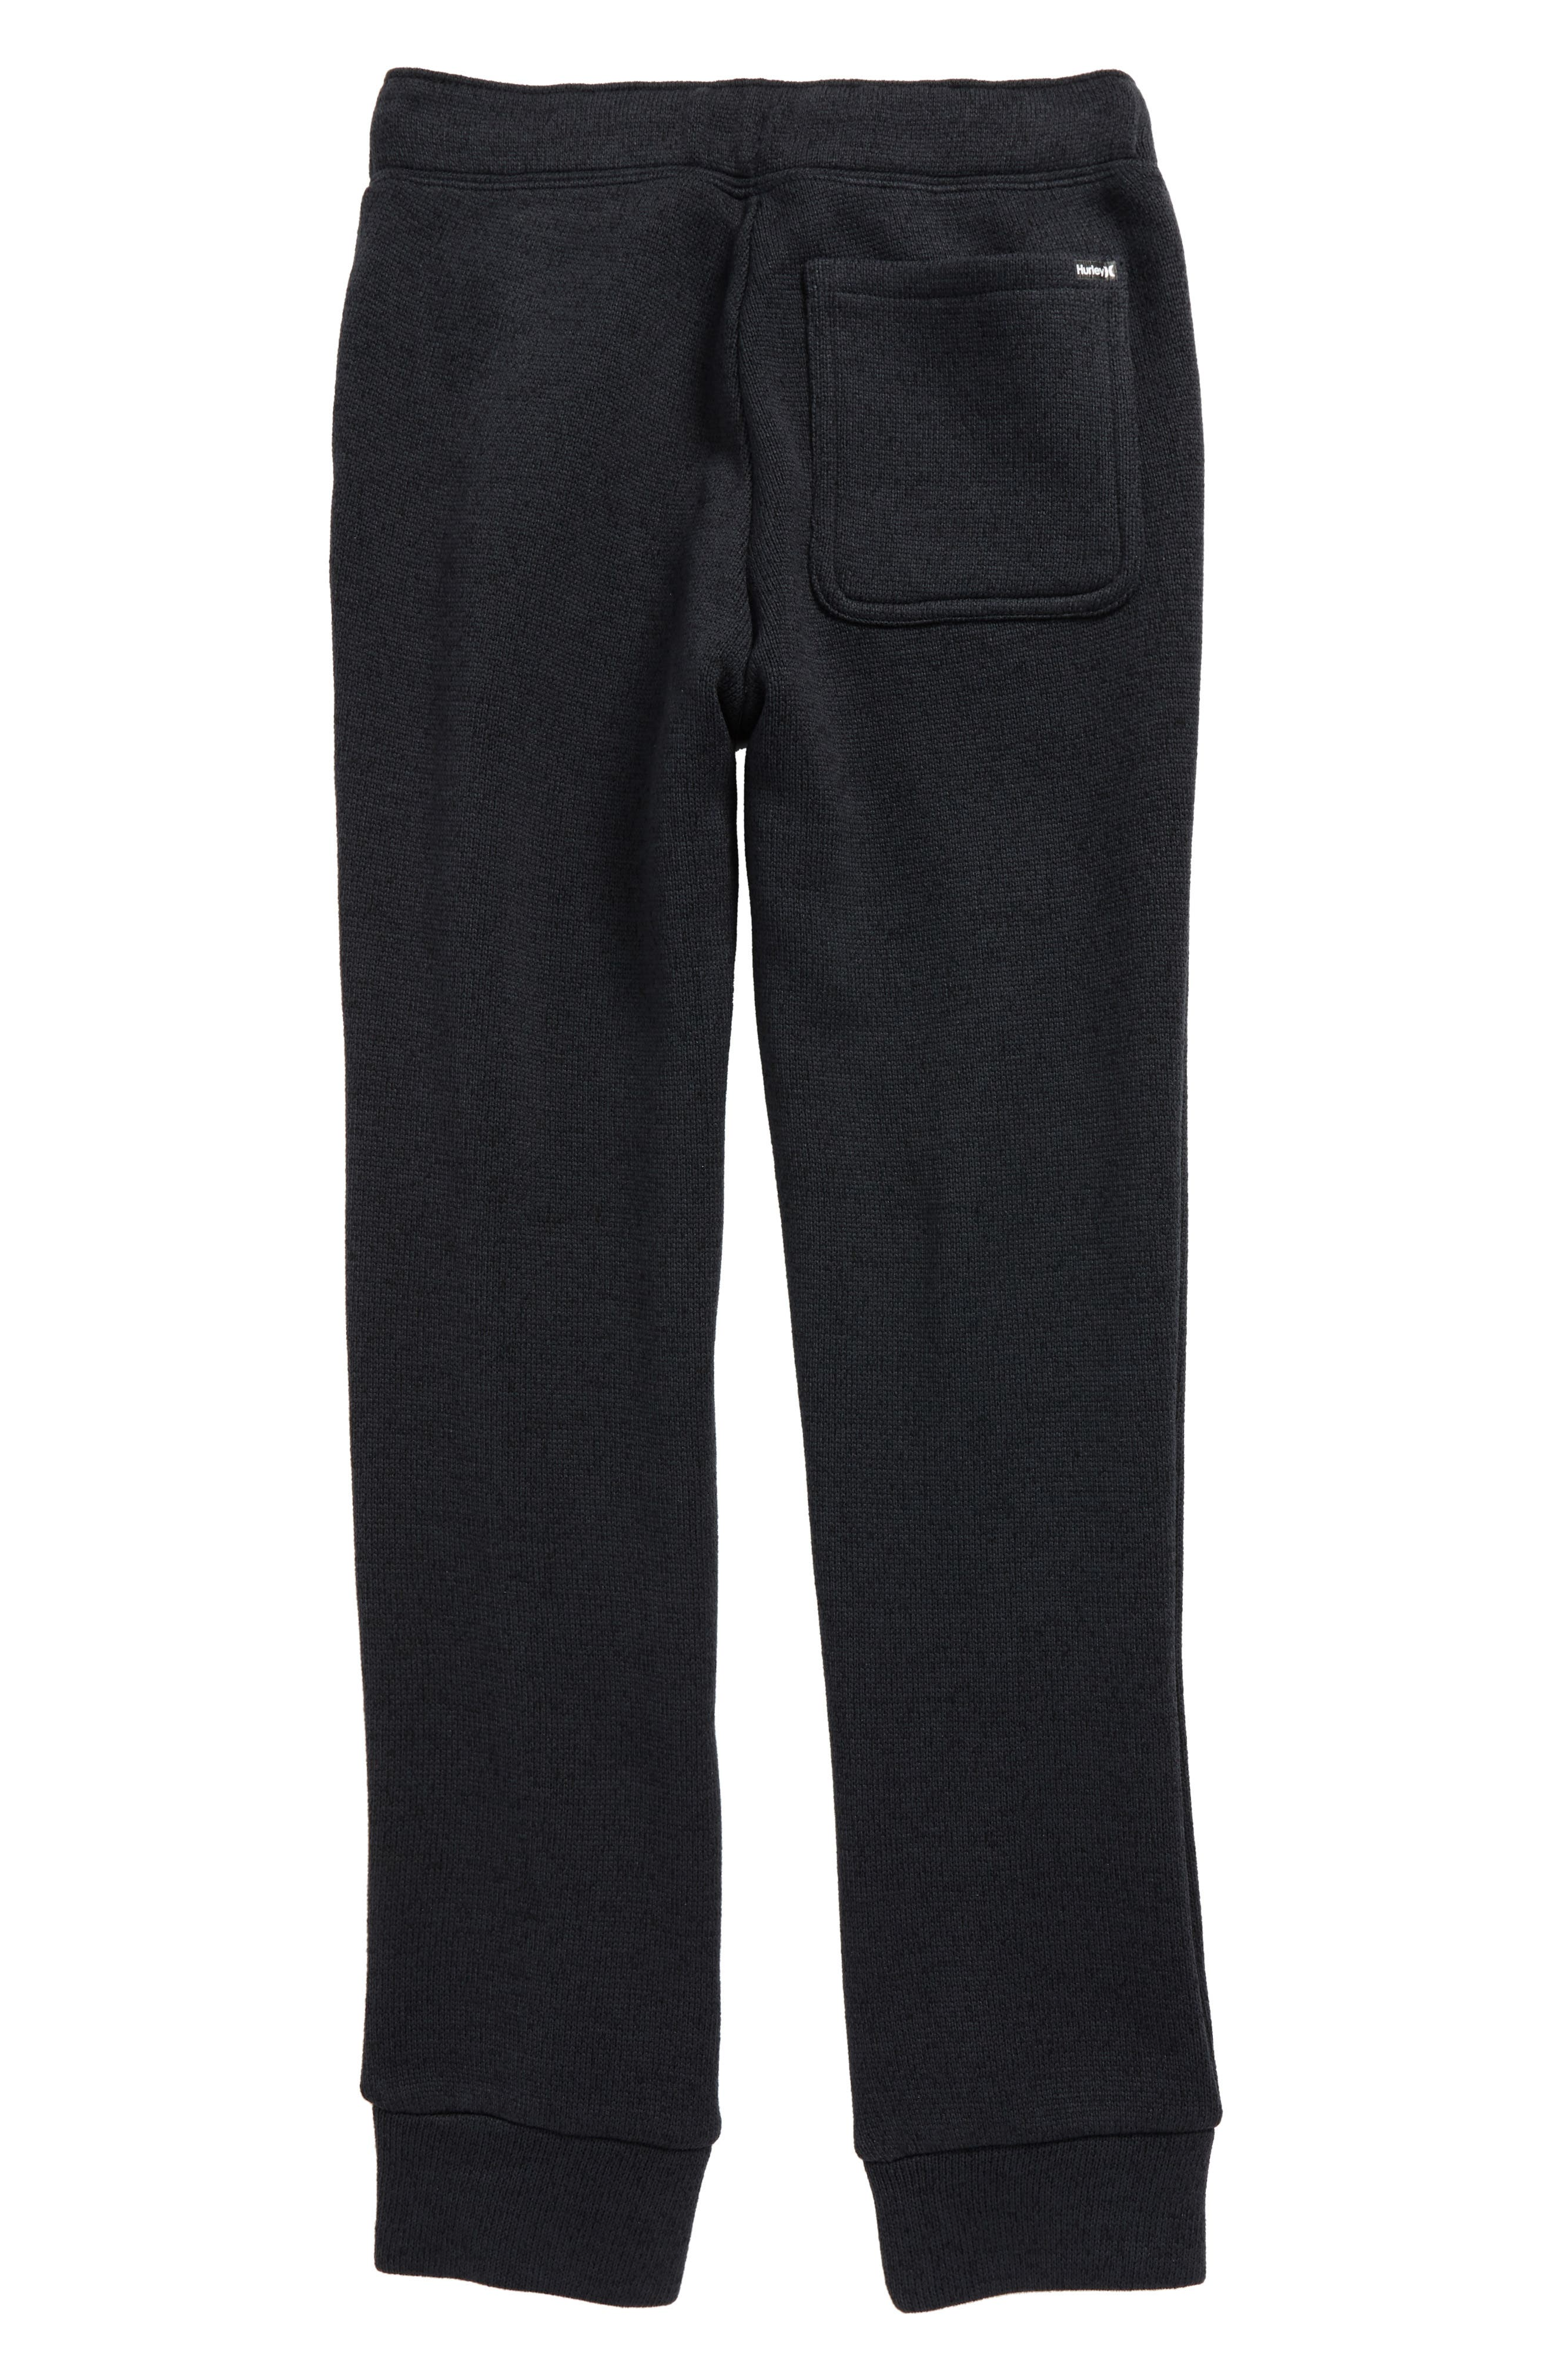 Sweater Knit Fleece Pants,                             Alternate thumbnail 3, color,